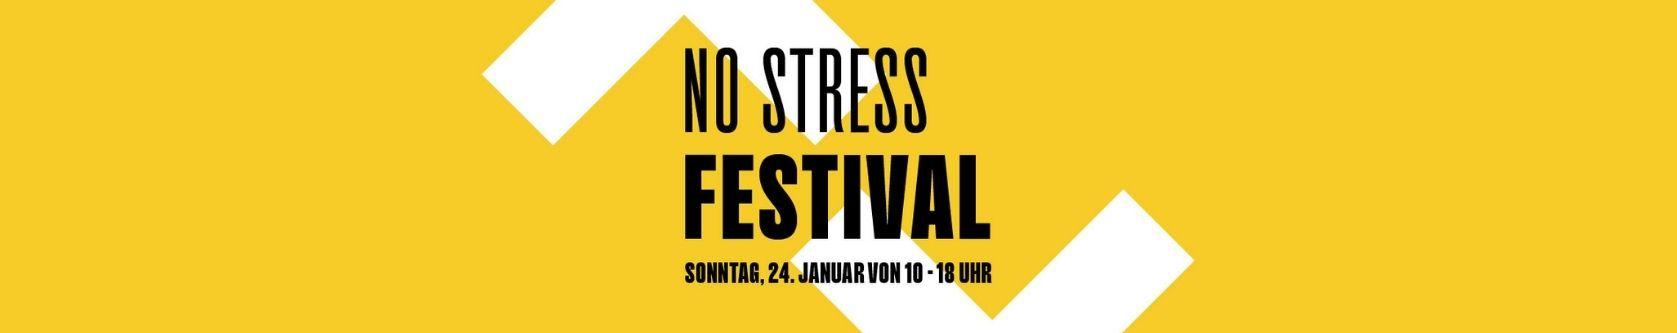 Eure Fragen, Hannahs Antworten - NO STRESS FESTIVAL